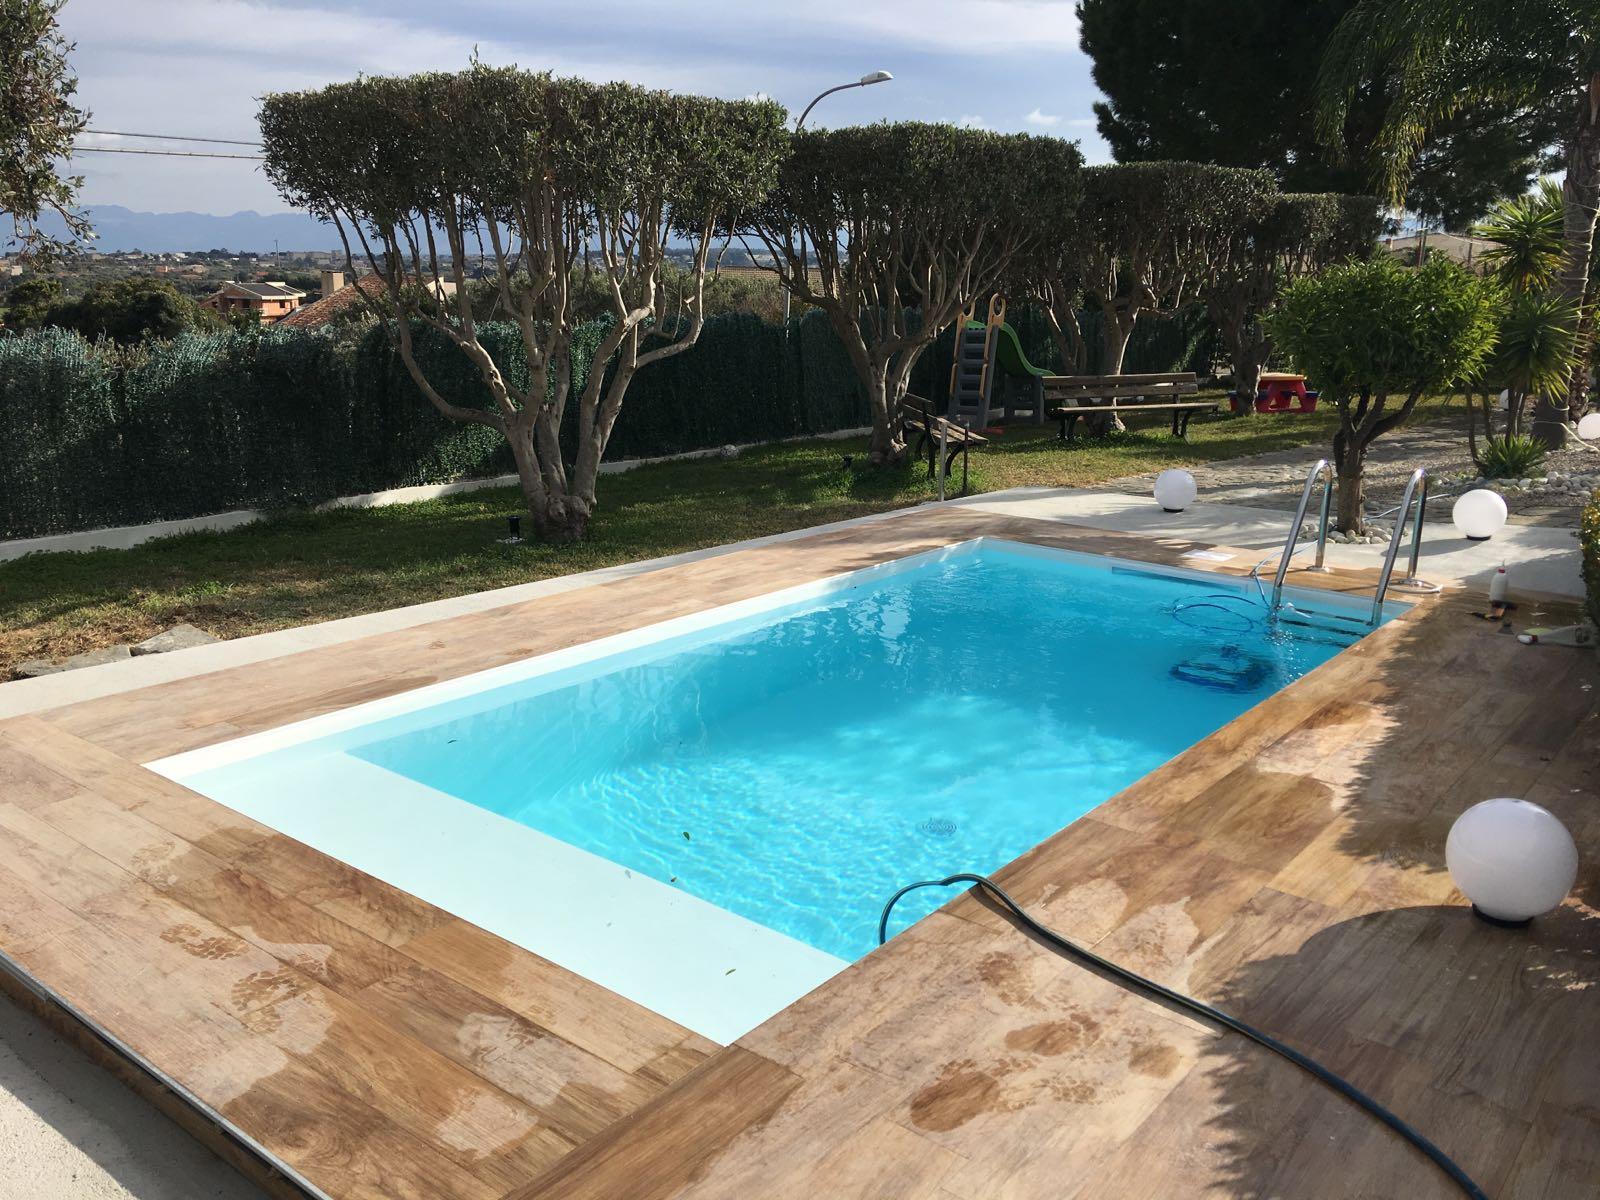 piscina 5 2x2 5 rettangolare telo bianco piscine foto